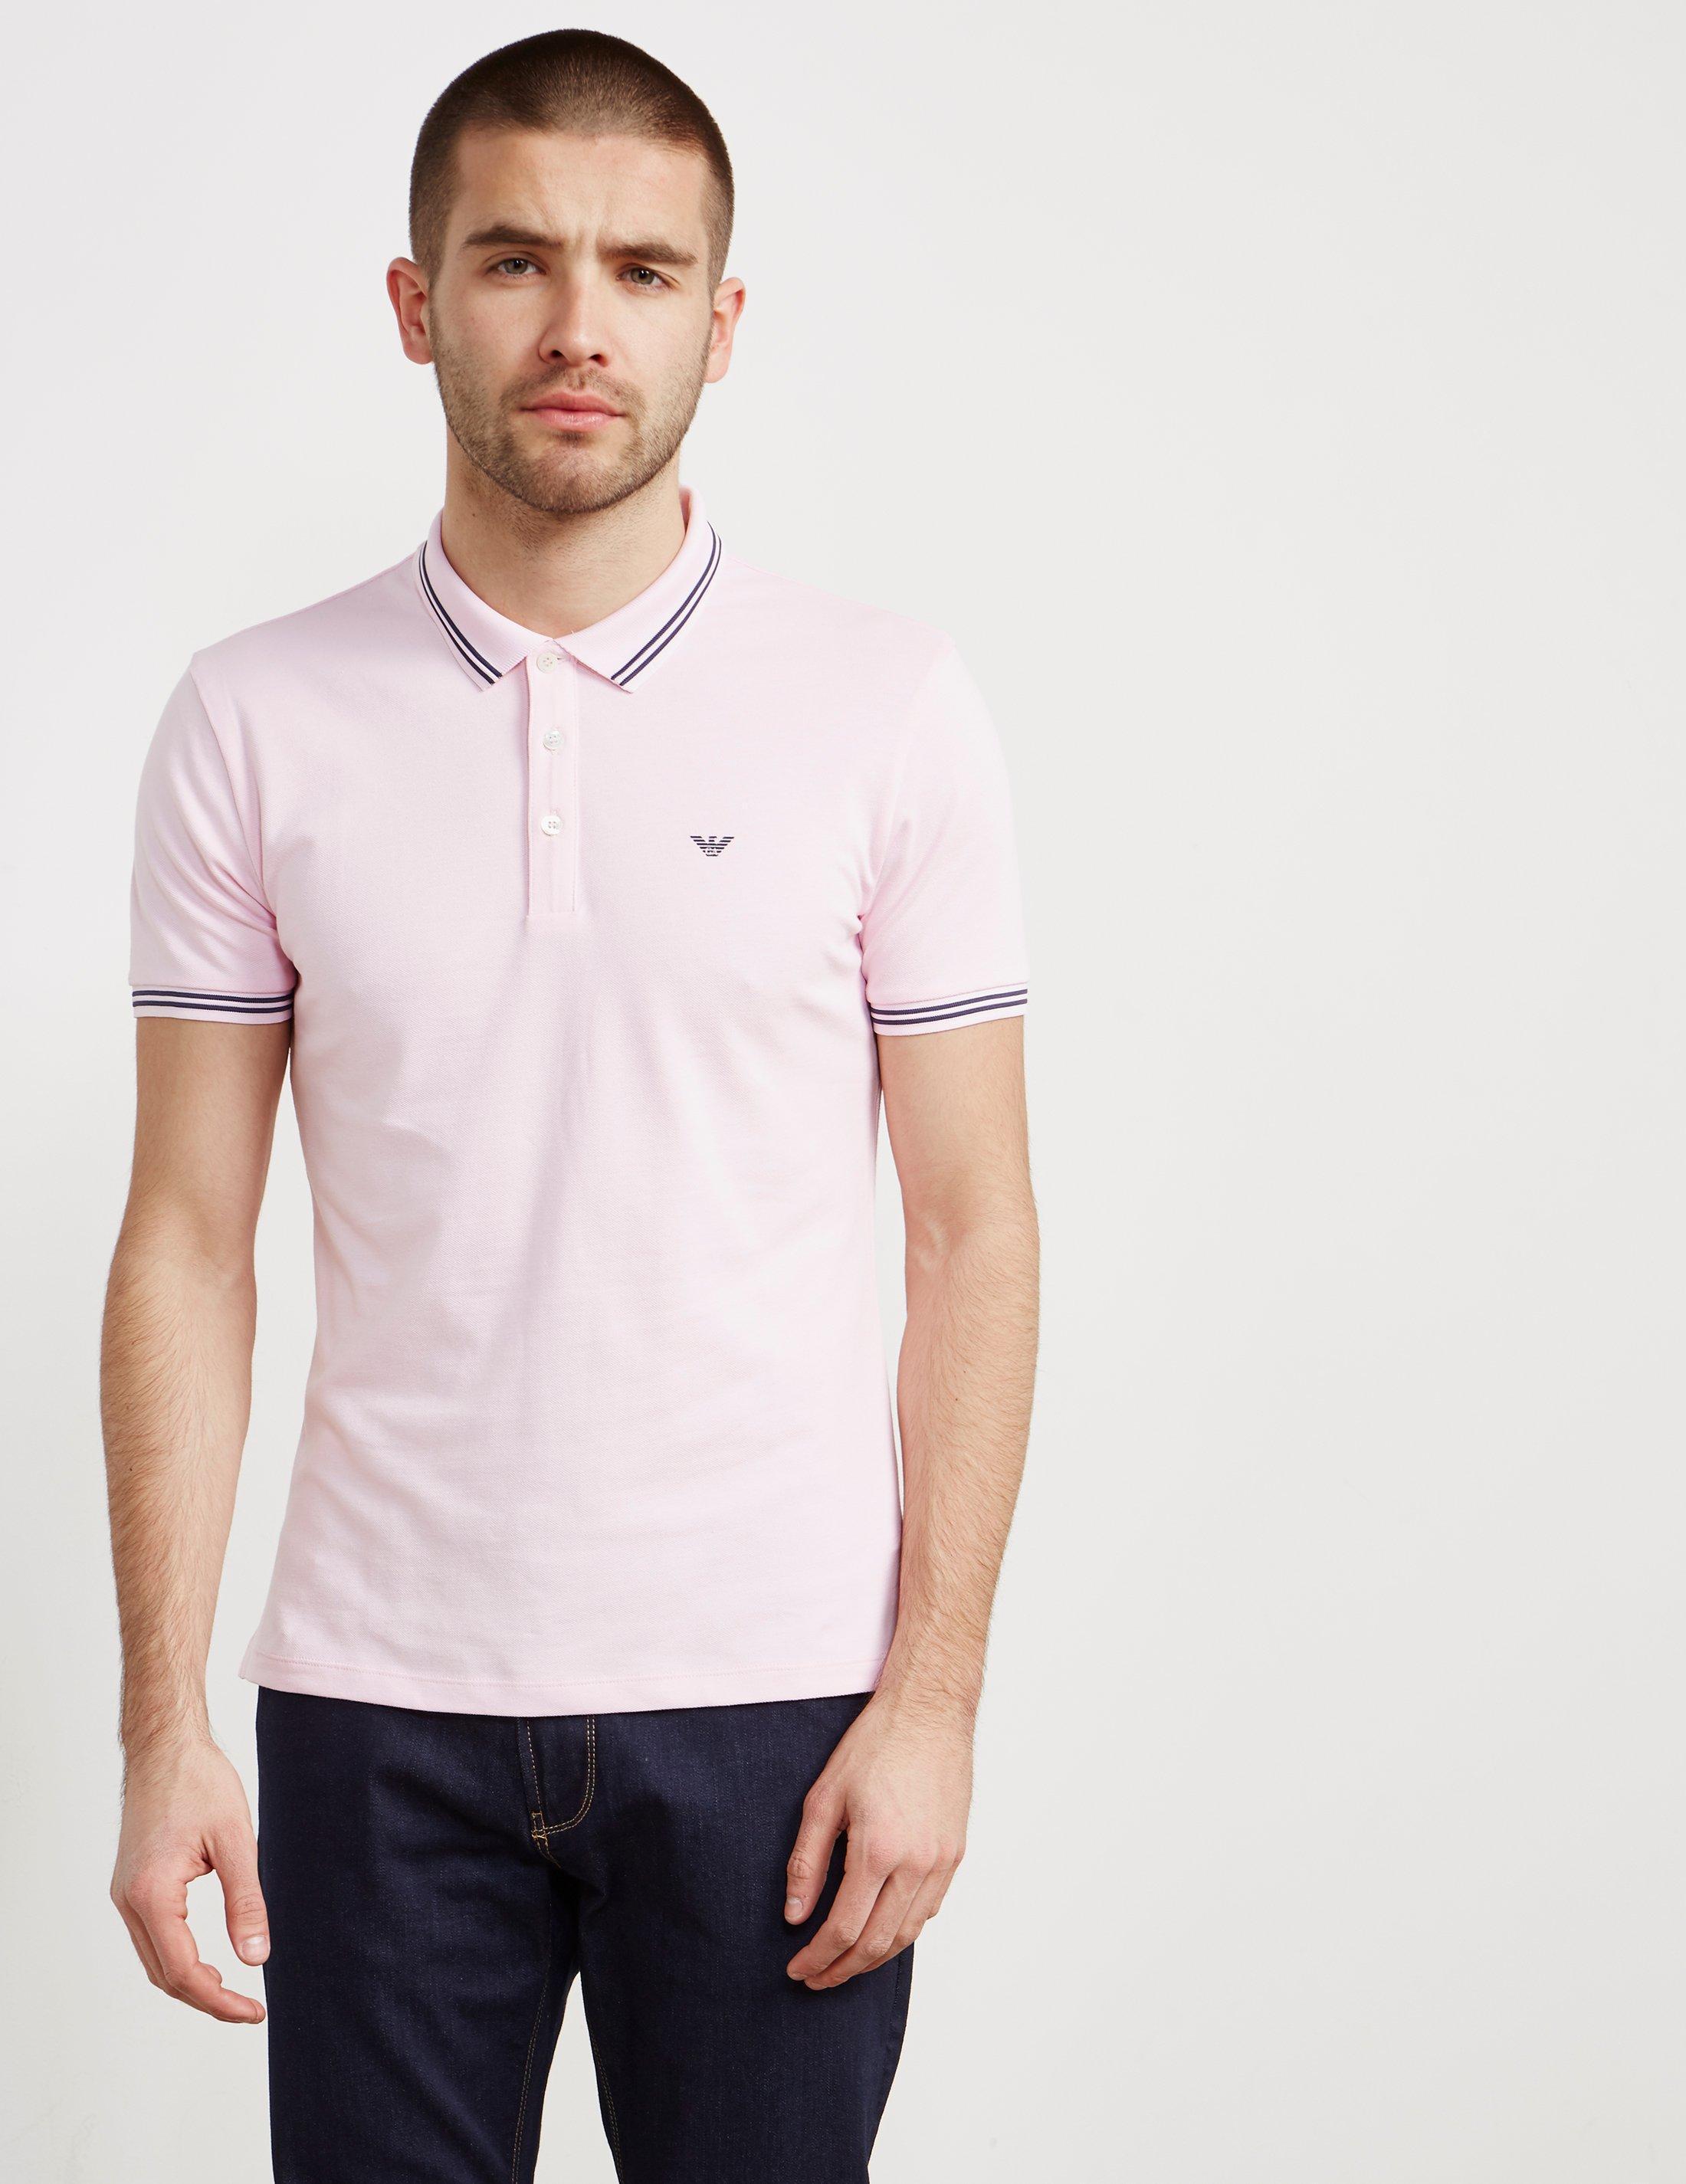 Emporio Armani. Mens Basic Tipped Short Sleeve Polo Shirt Pink/pink